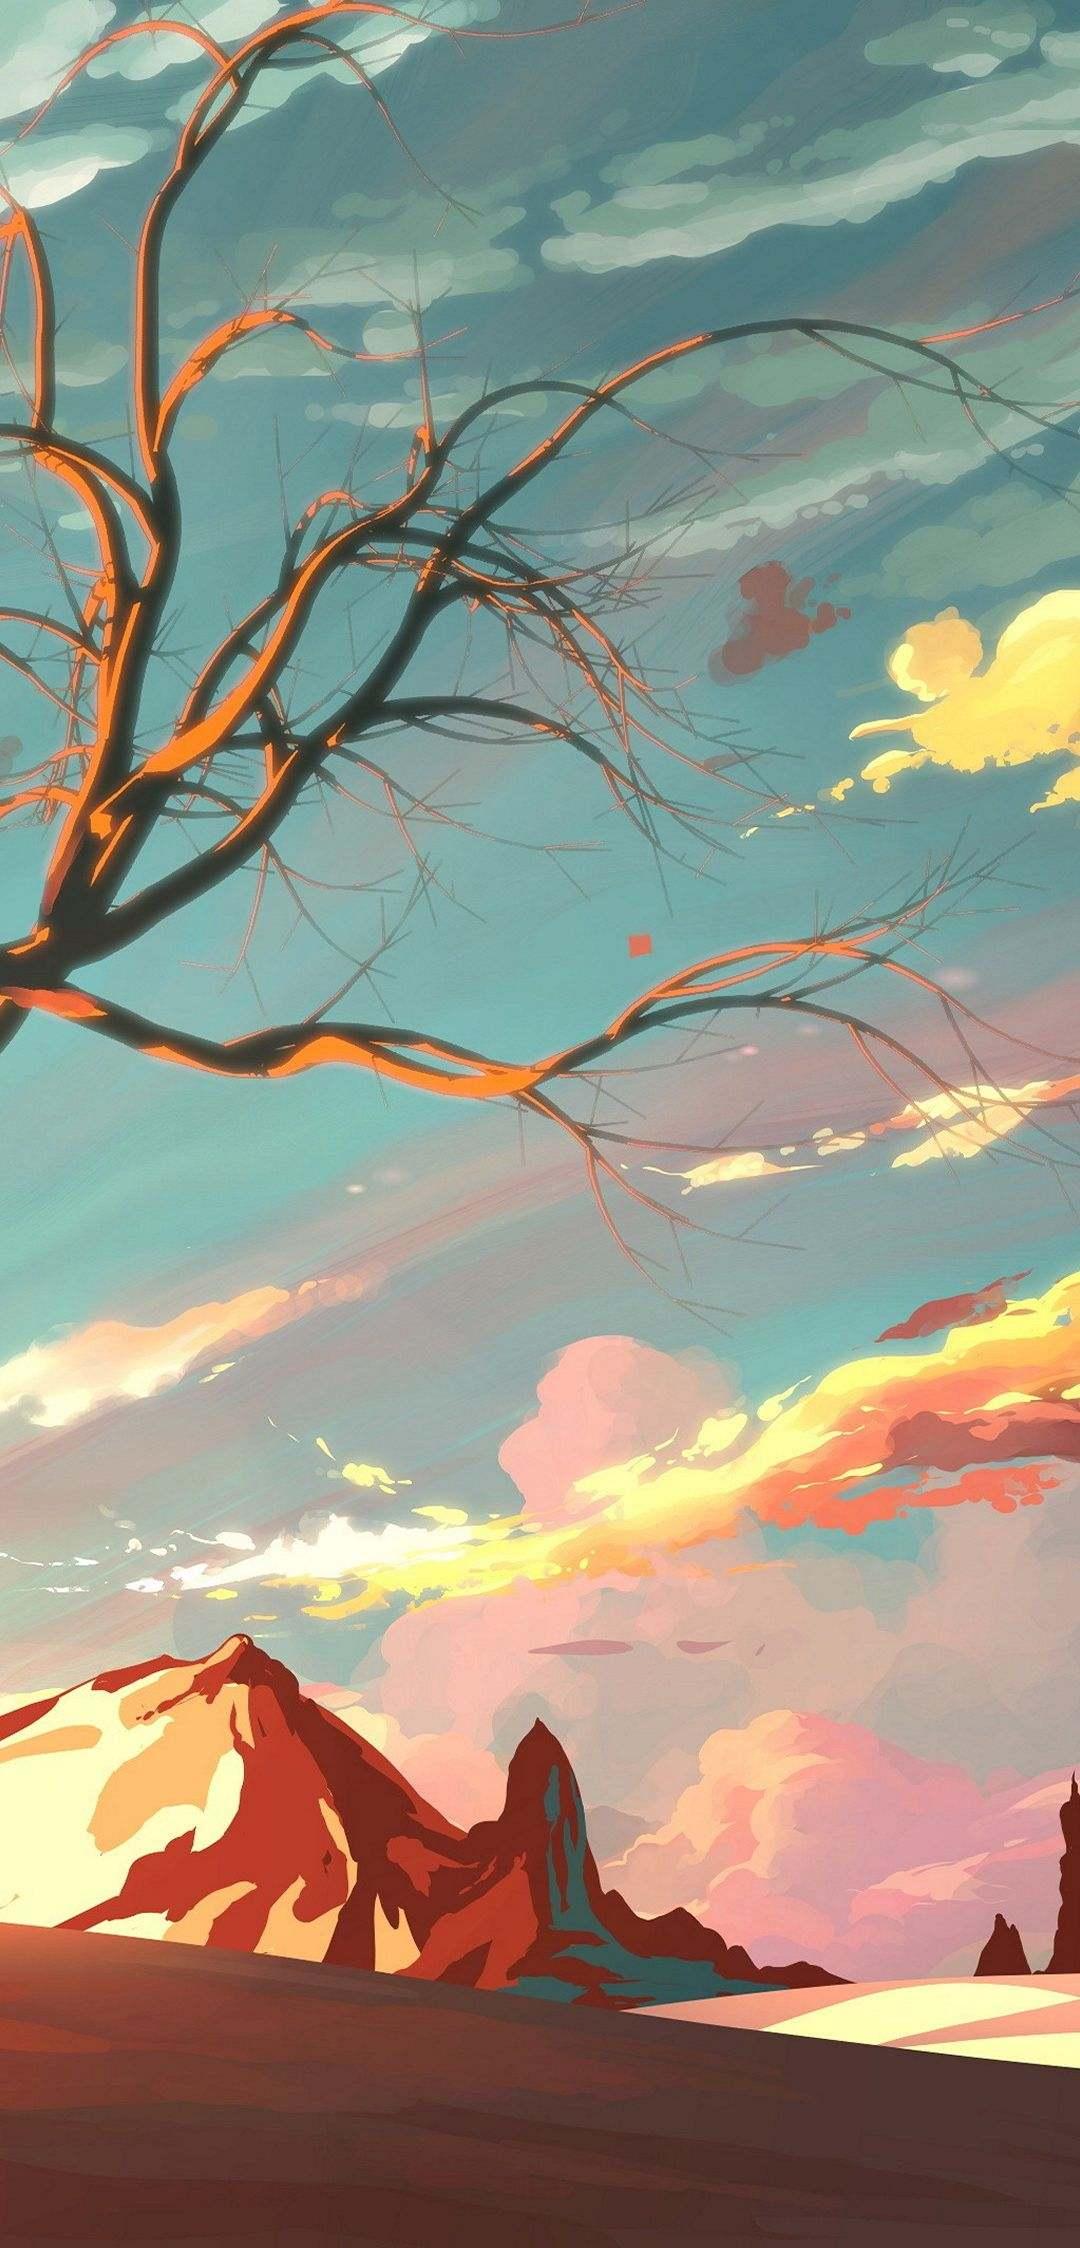 Artistic Landscape Wallpaper